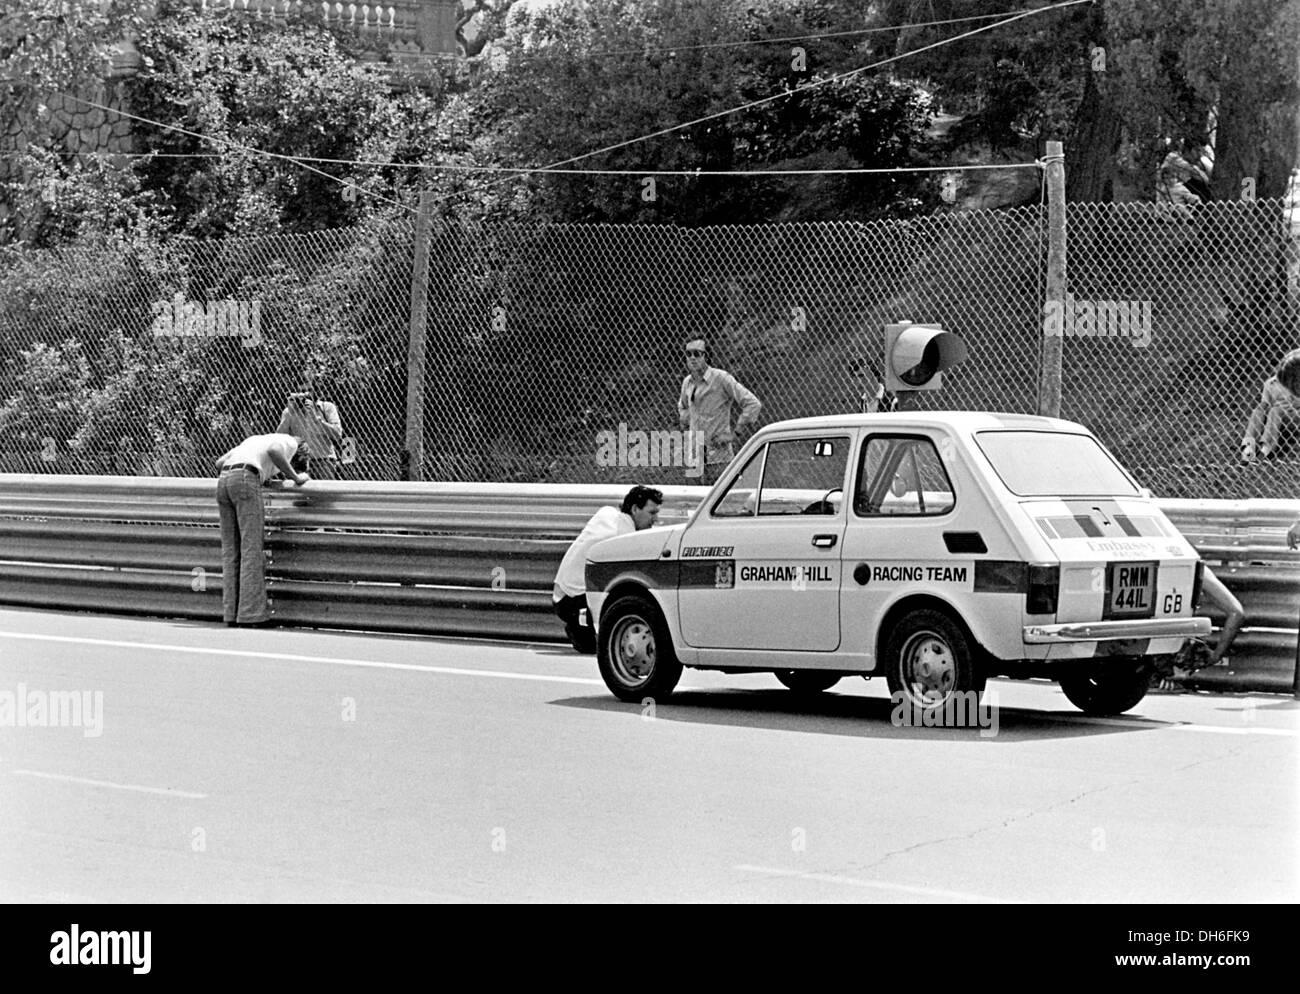 Graham Hill Racing Team's Fiat 126 car at the Spanish GP, Barcelona, Spain 1975. - Stock Image